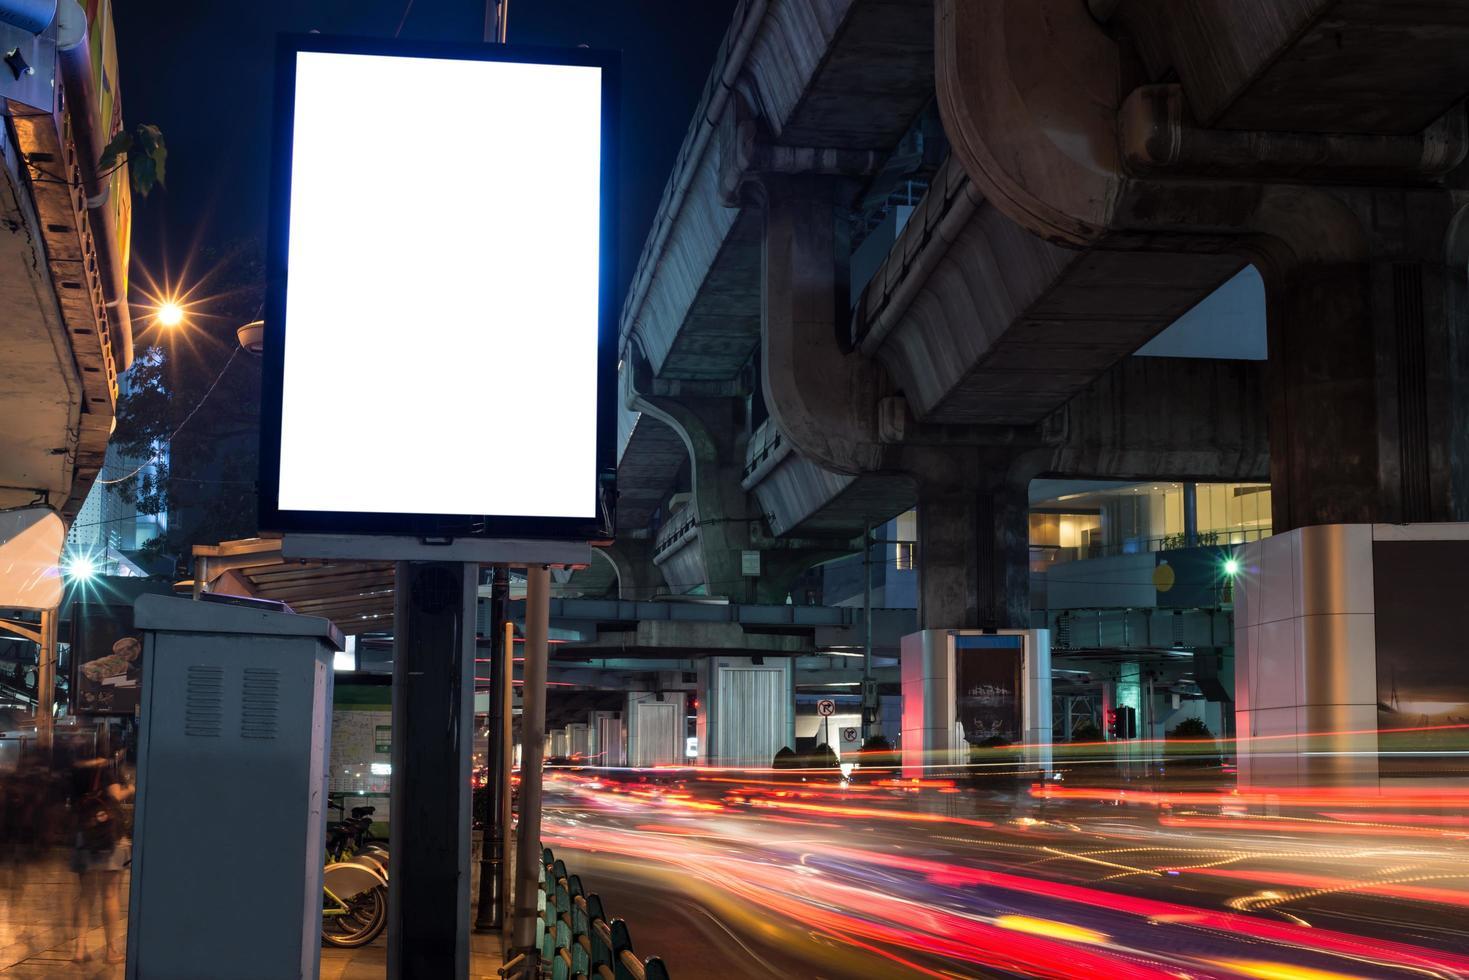 leeg bord met kopie ruimte naast weg 's nachts foto